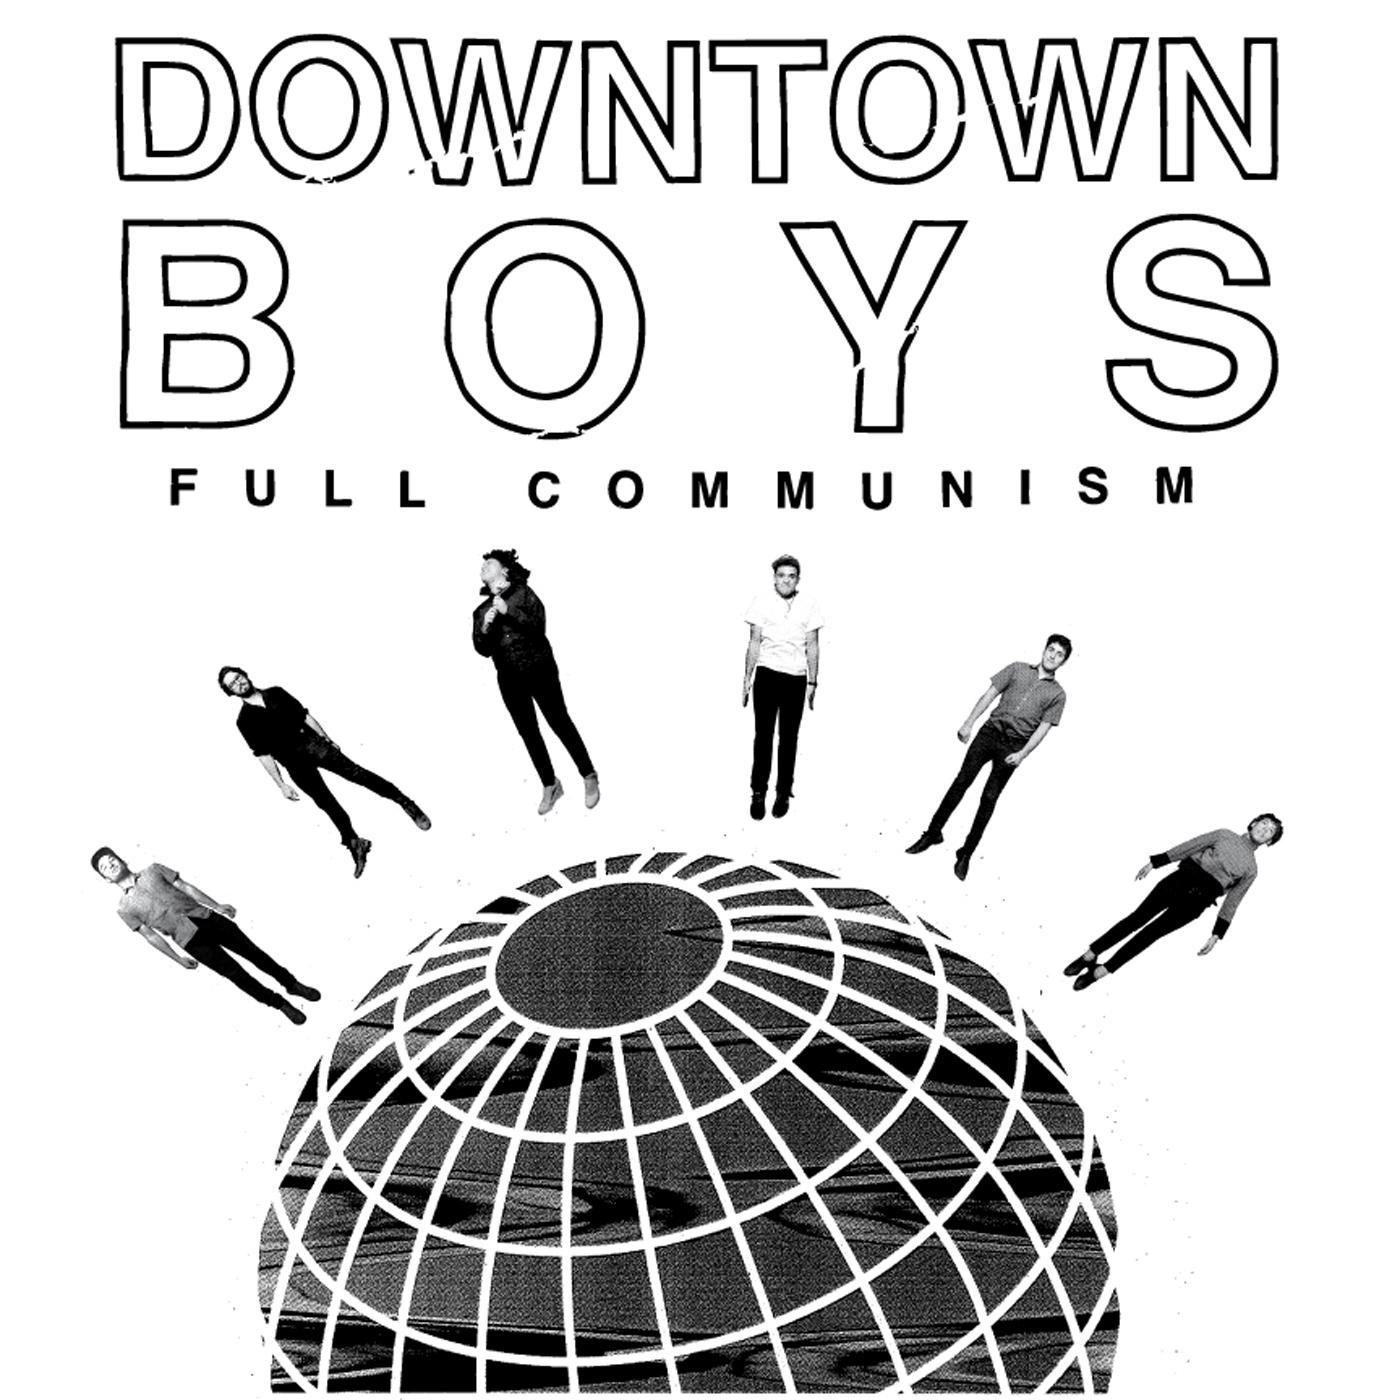 18763-DG-94DowntownBoys1400